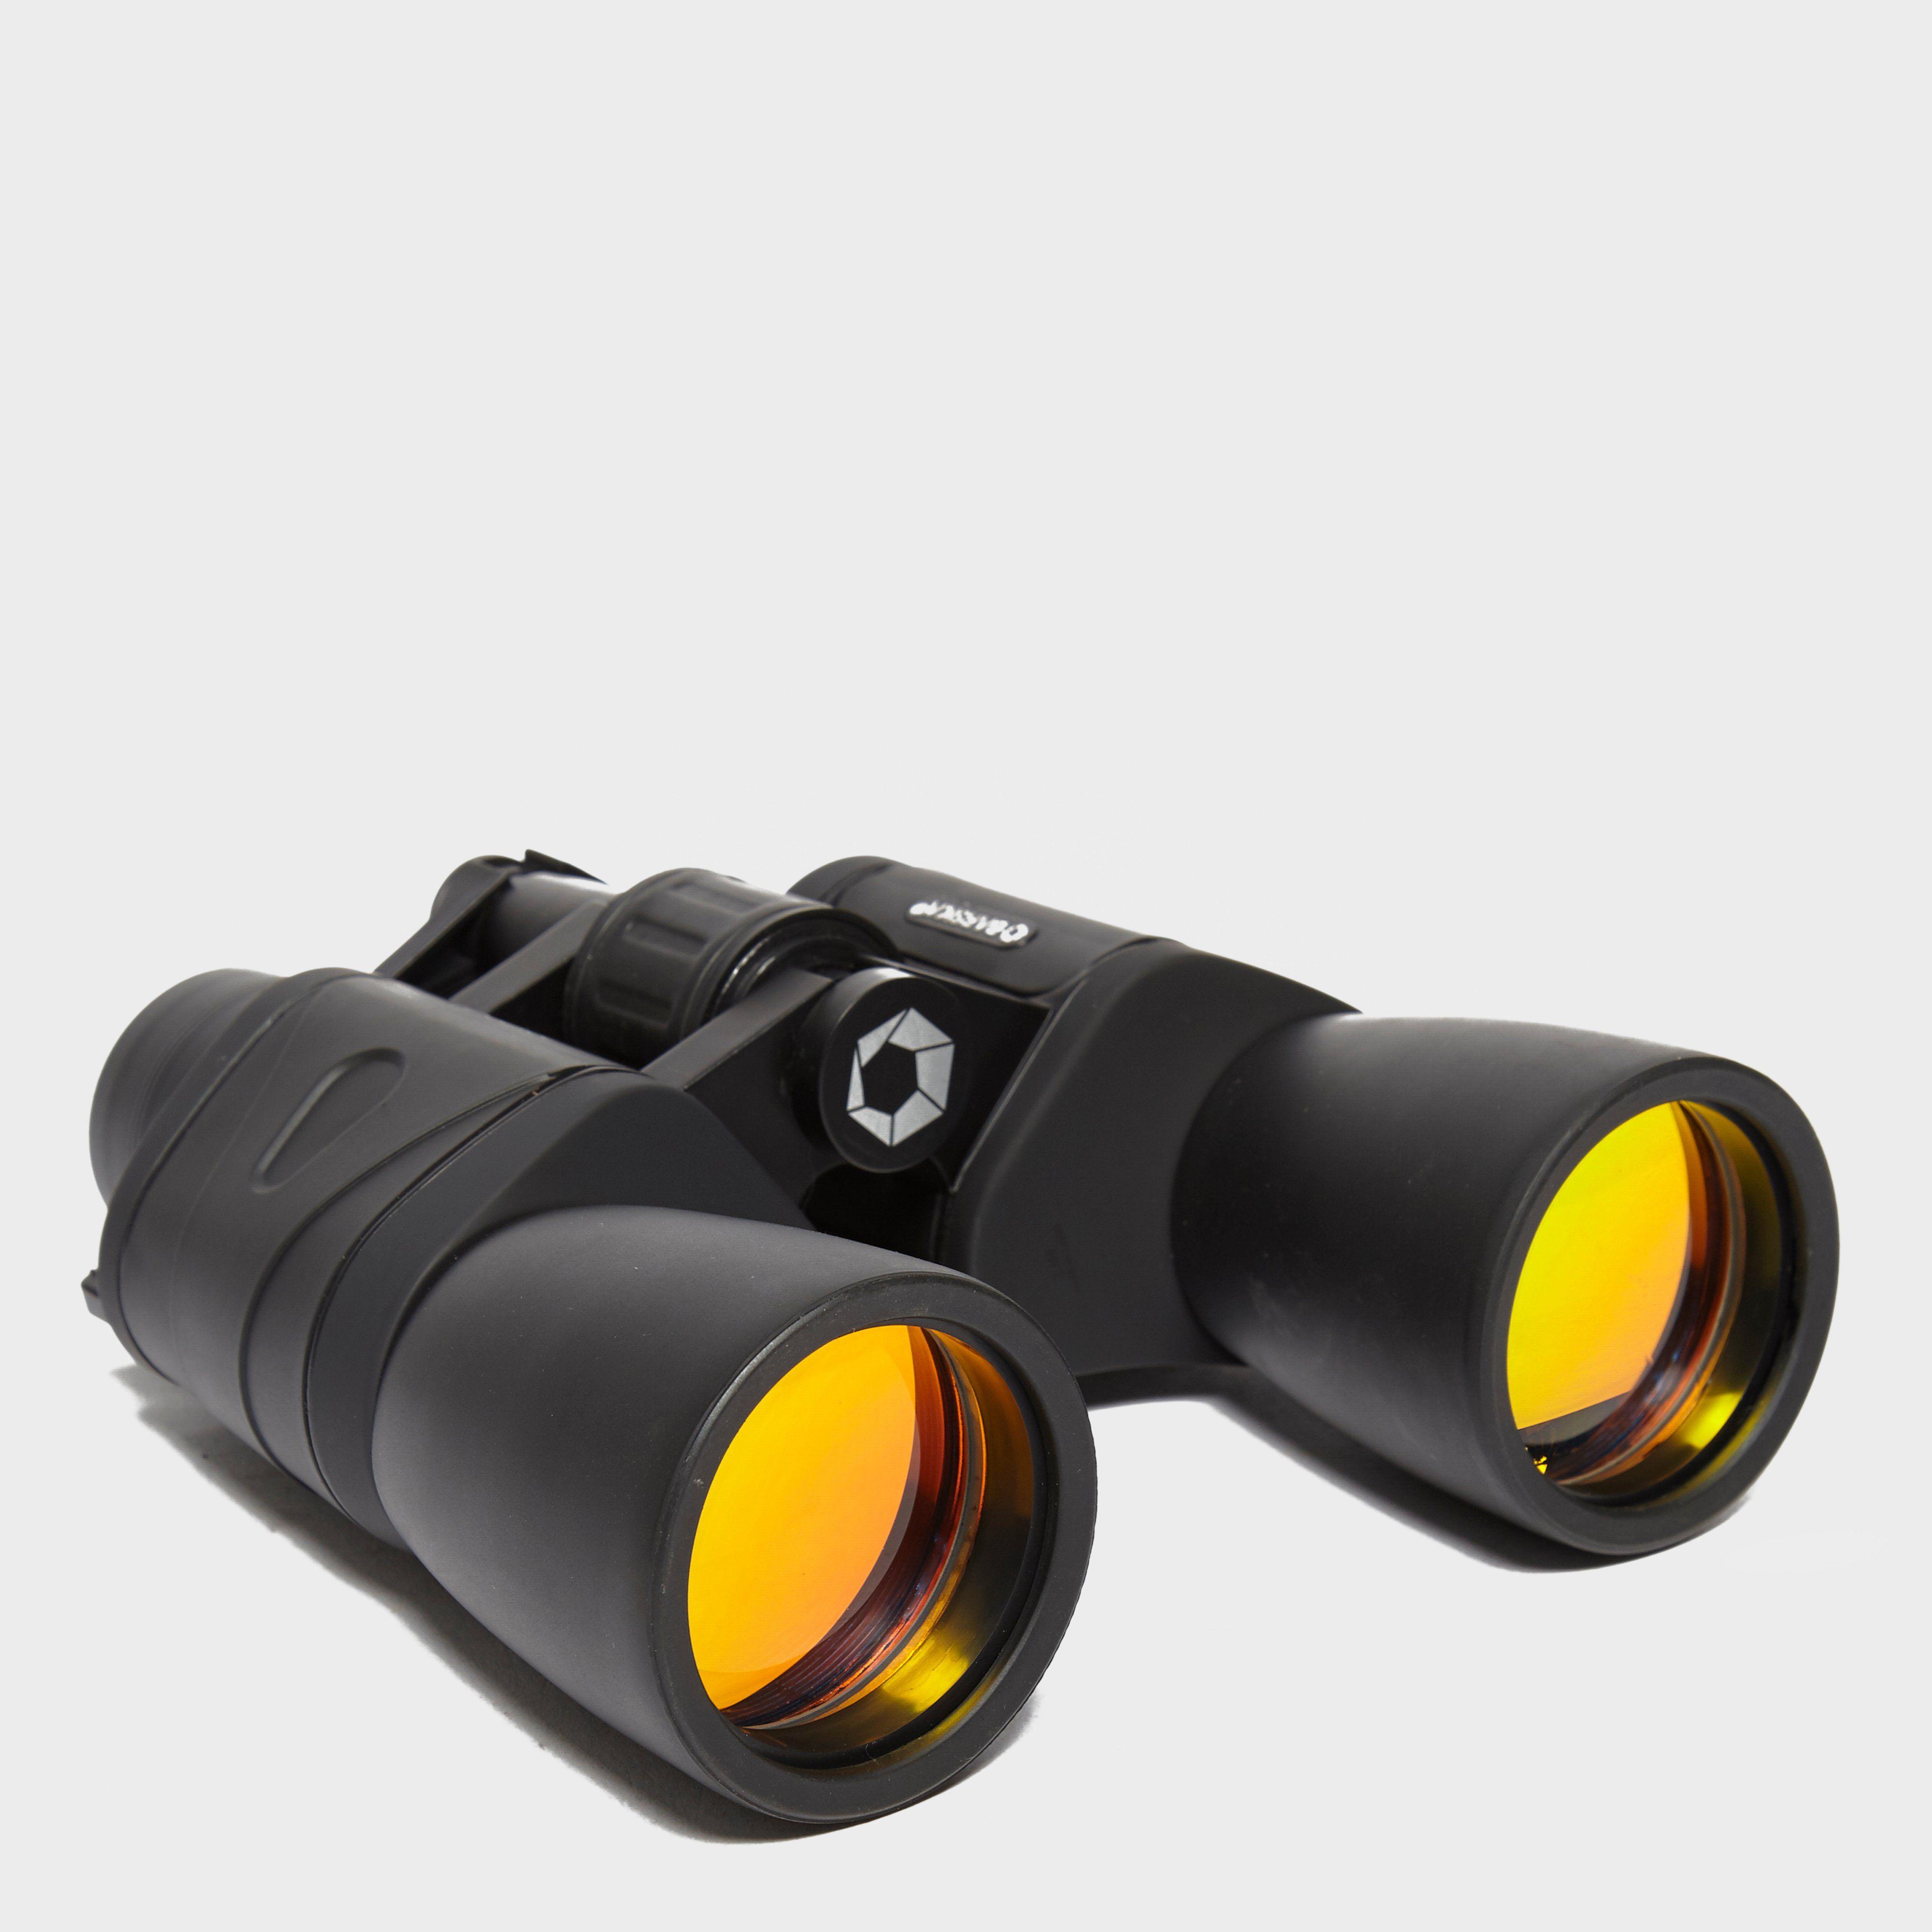 BARSKA Gladiator Zoom Binoculars 1-30 x 50mm